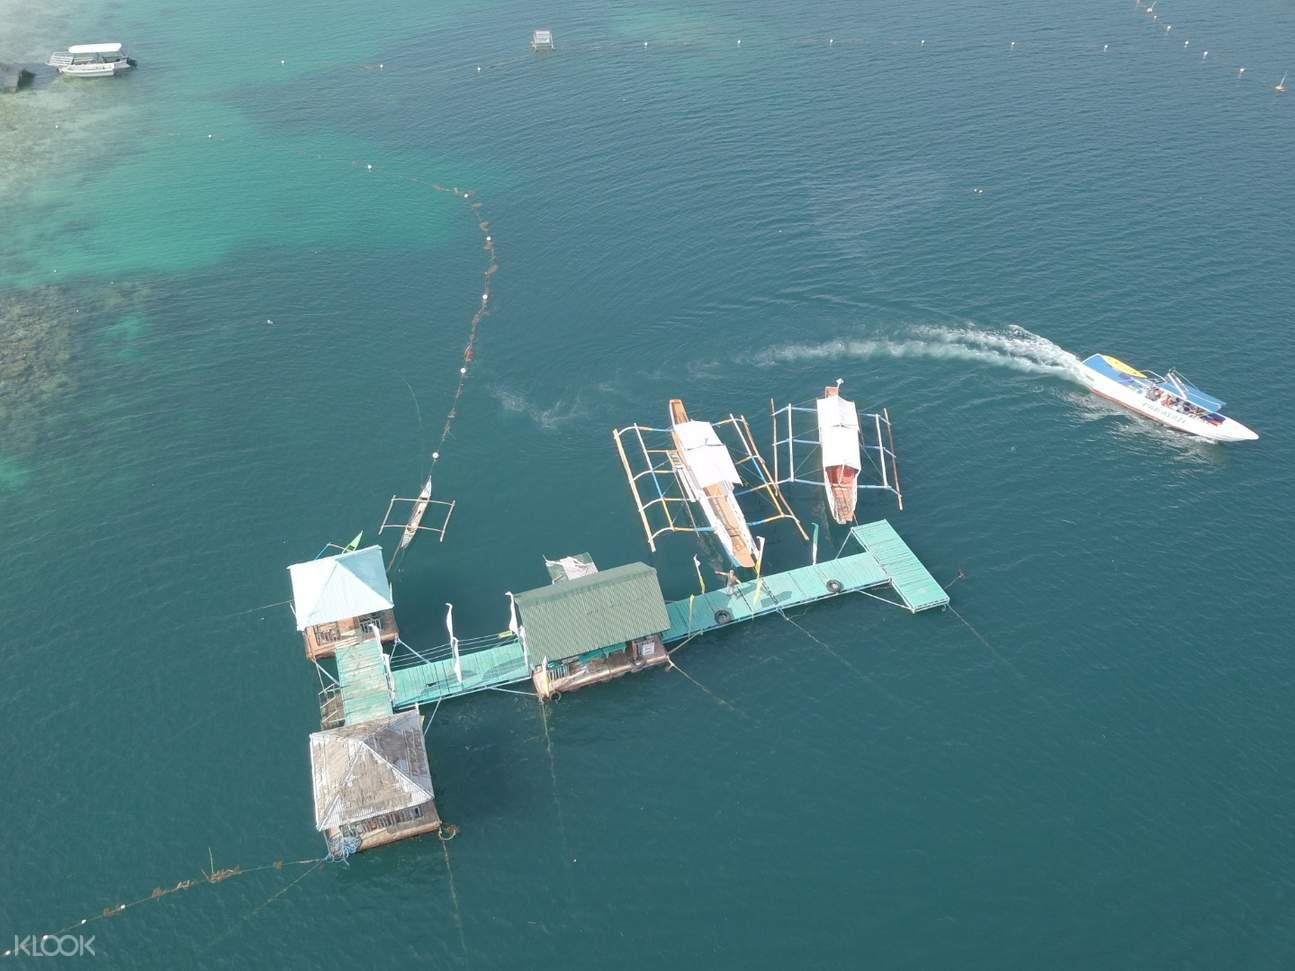 samal island fishery